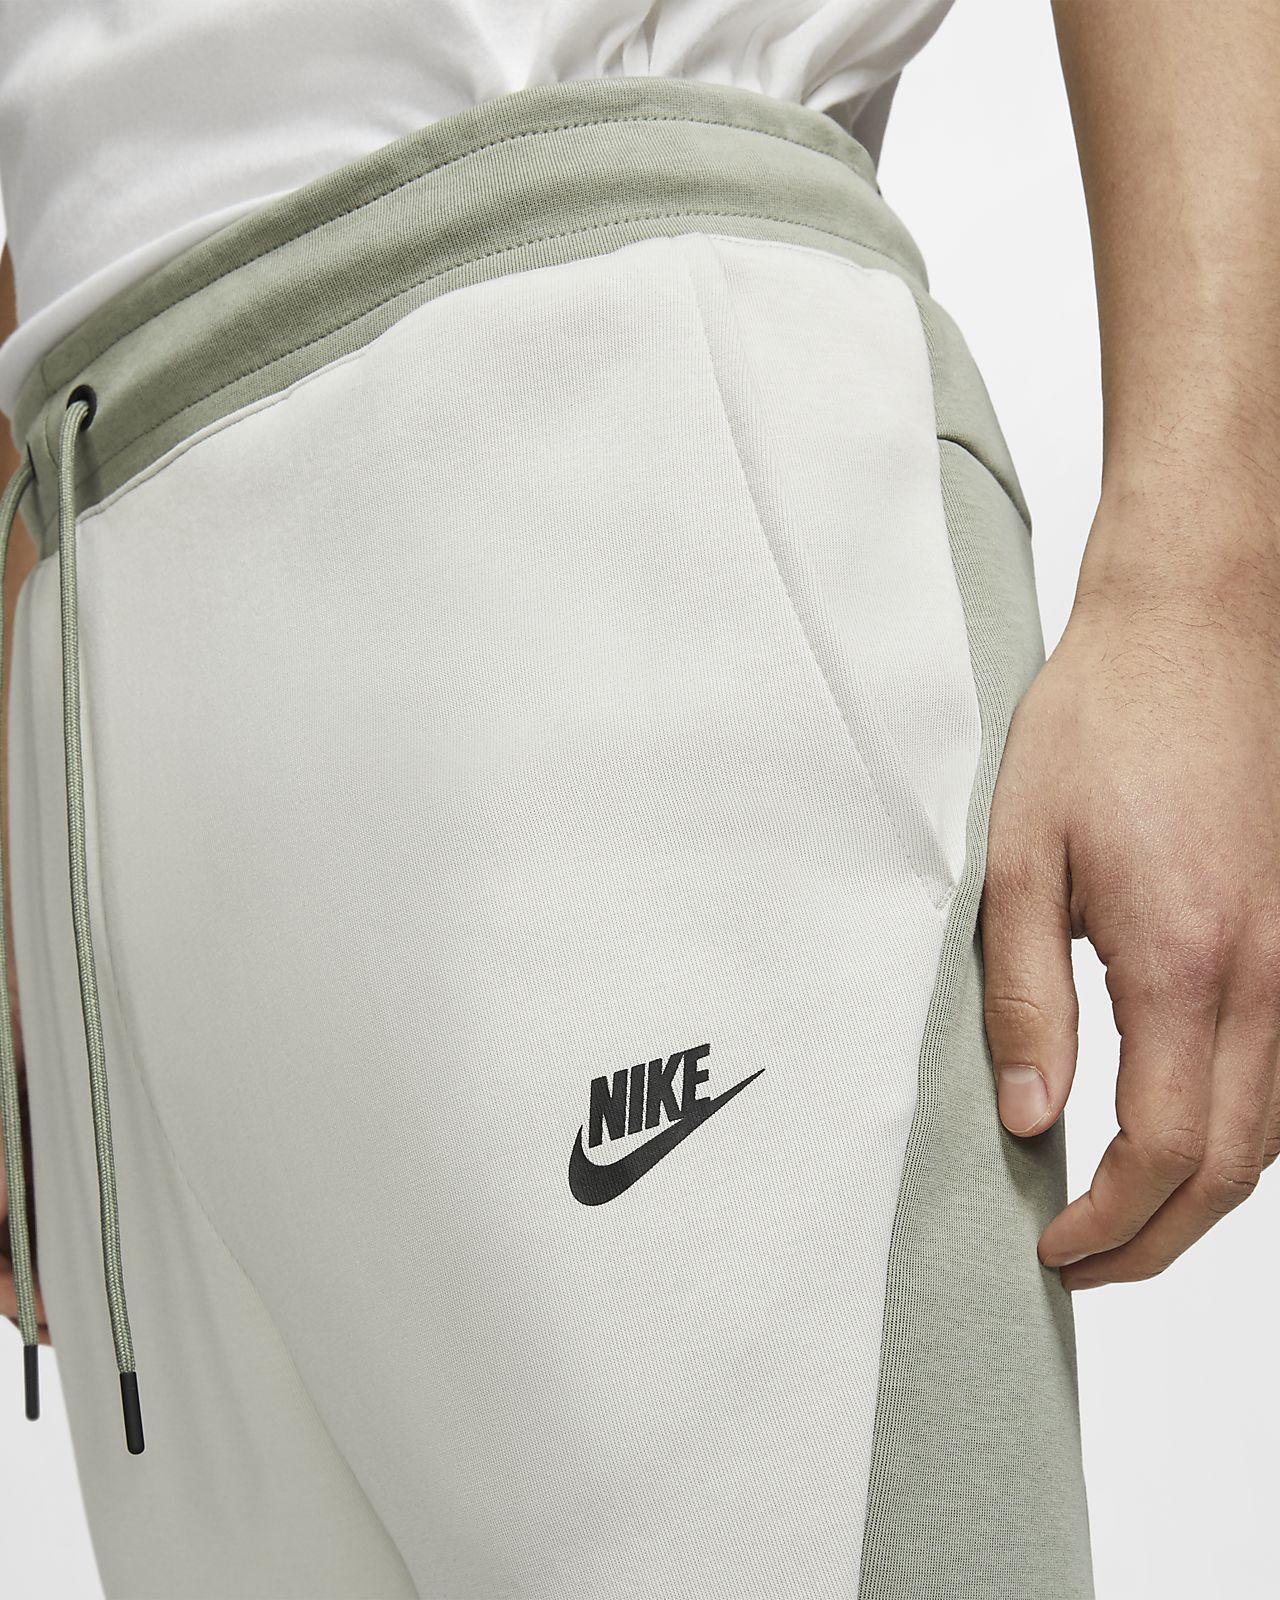 9e1b0e3b4a5fed Nike Sportswear Tech Fleece Men's Joggers. Nike.com GB